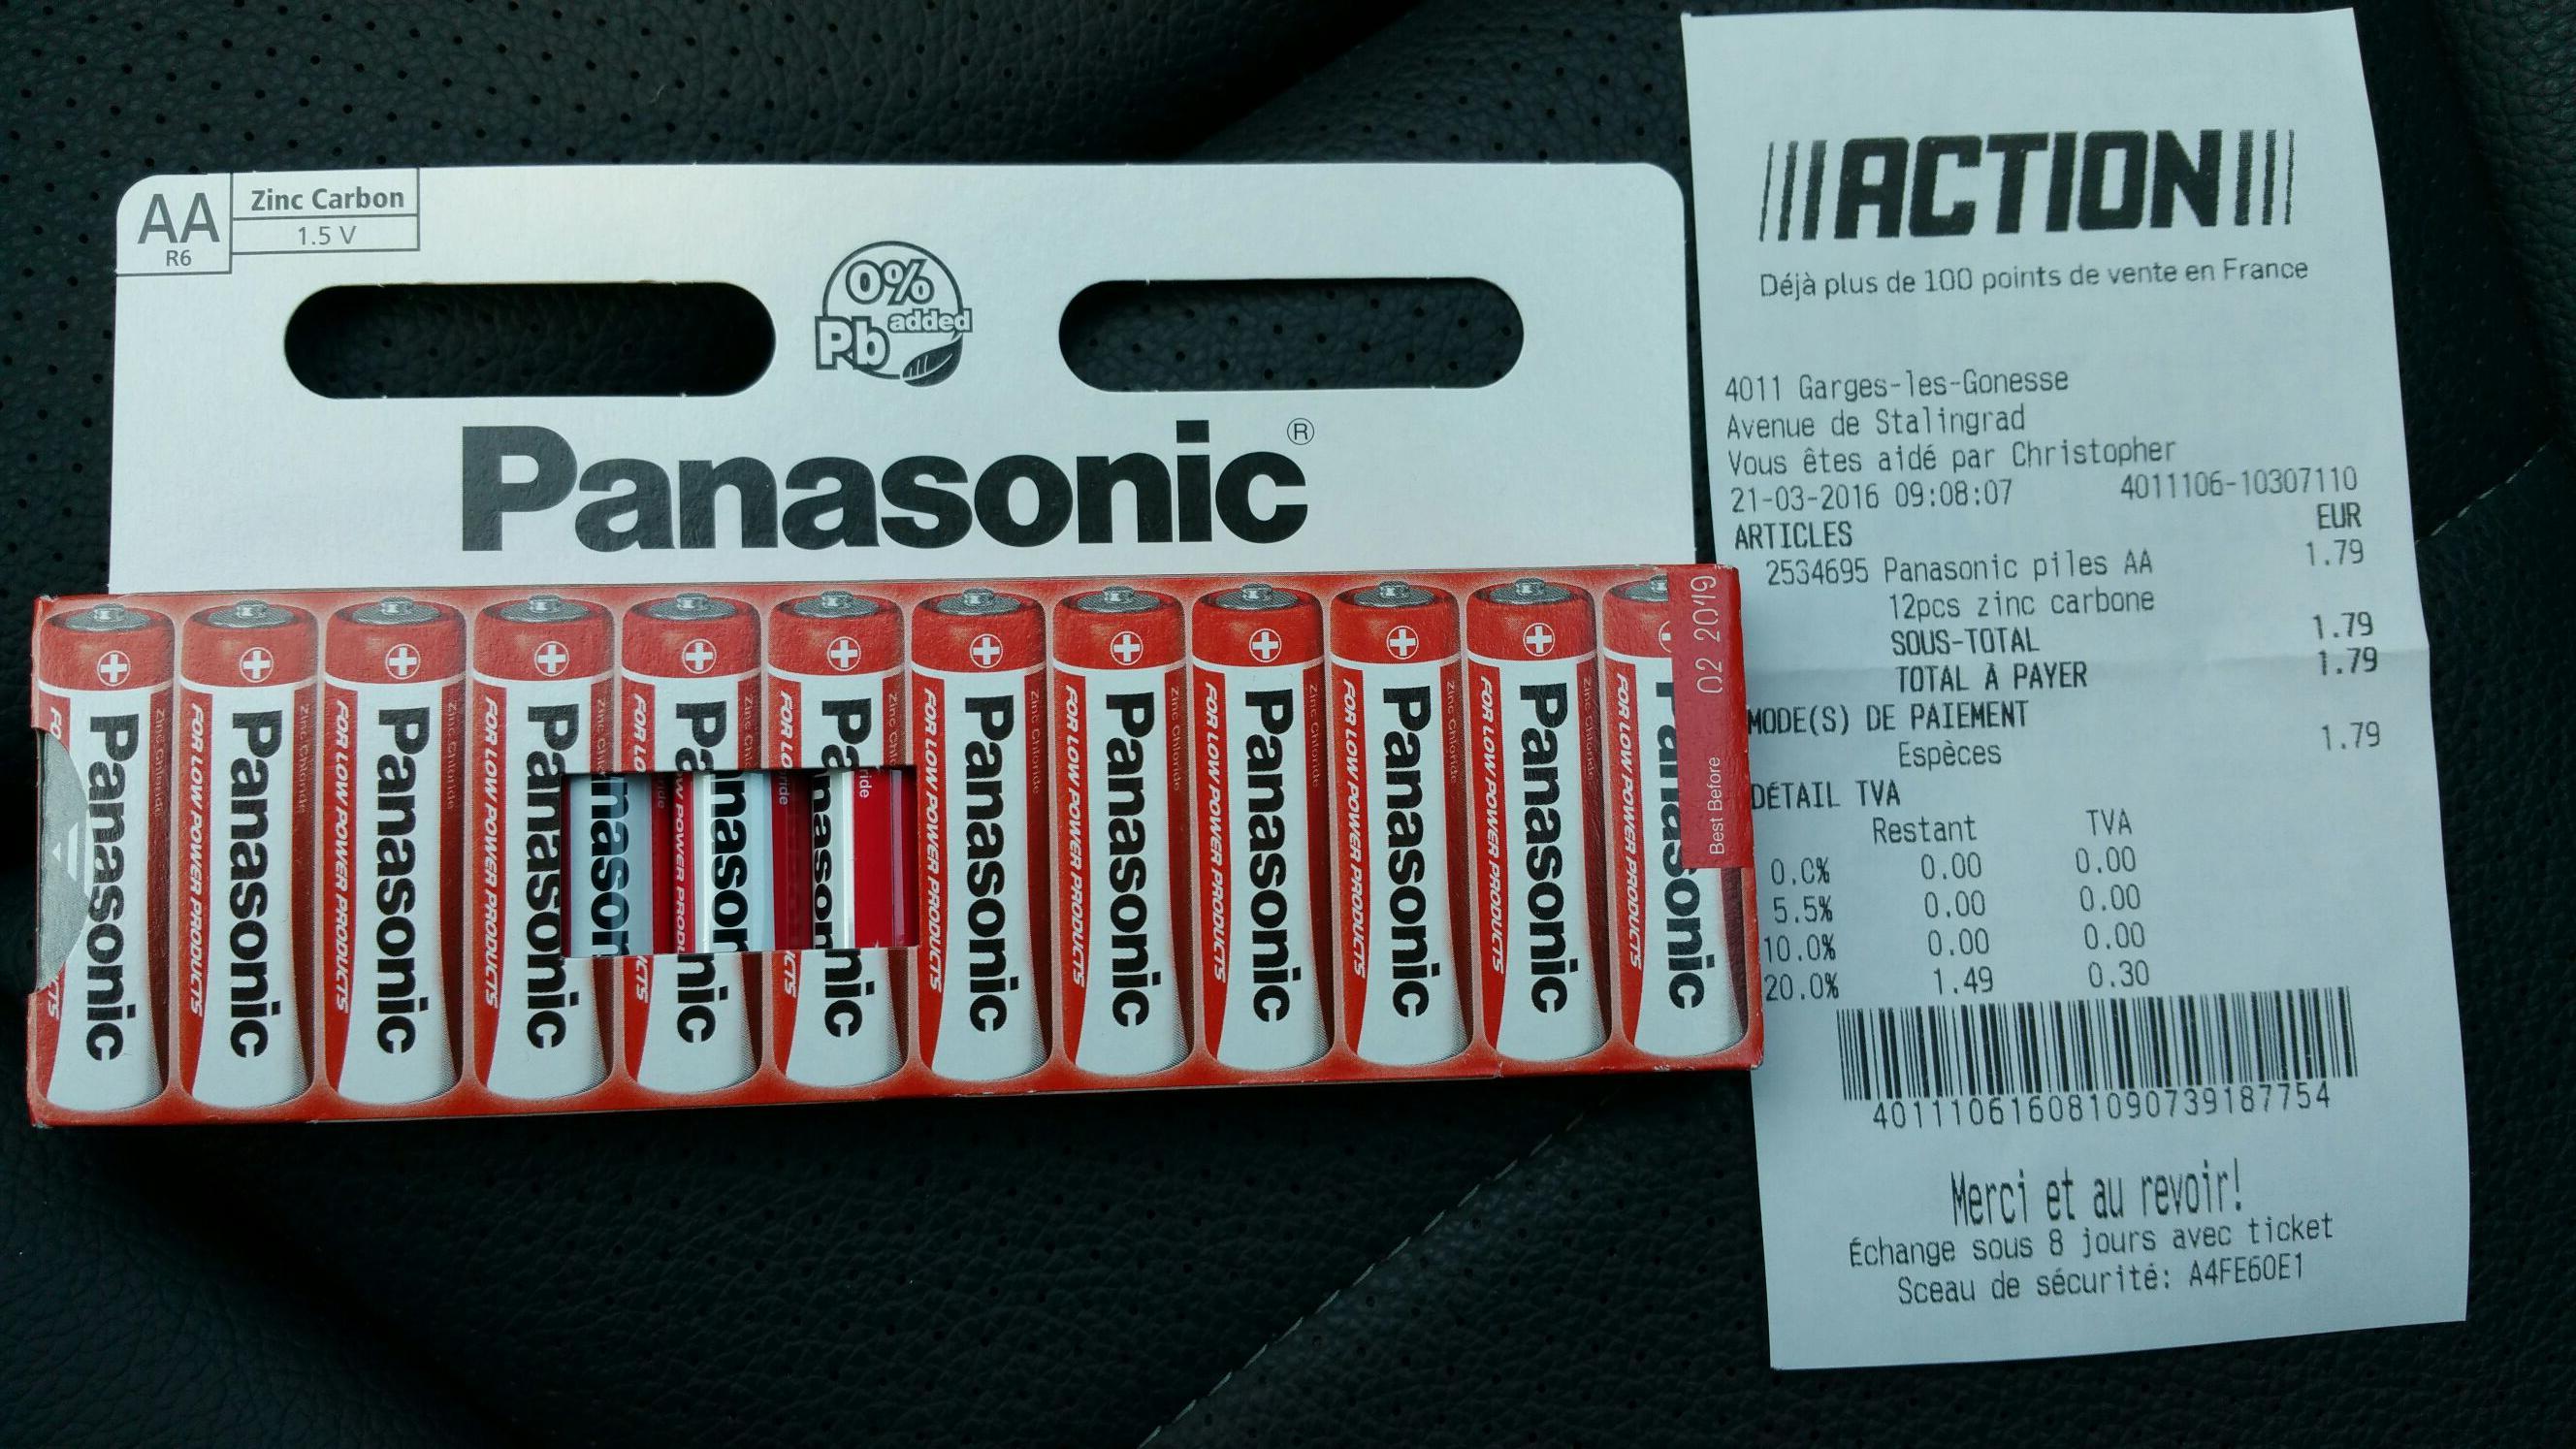 12 piles SALINES Panasonic AA ou AAA 1.5 V